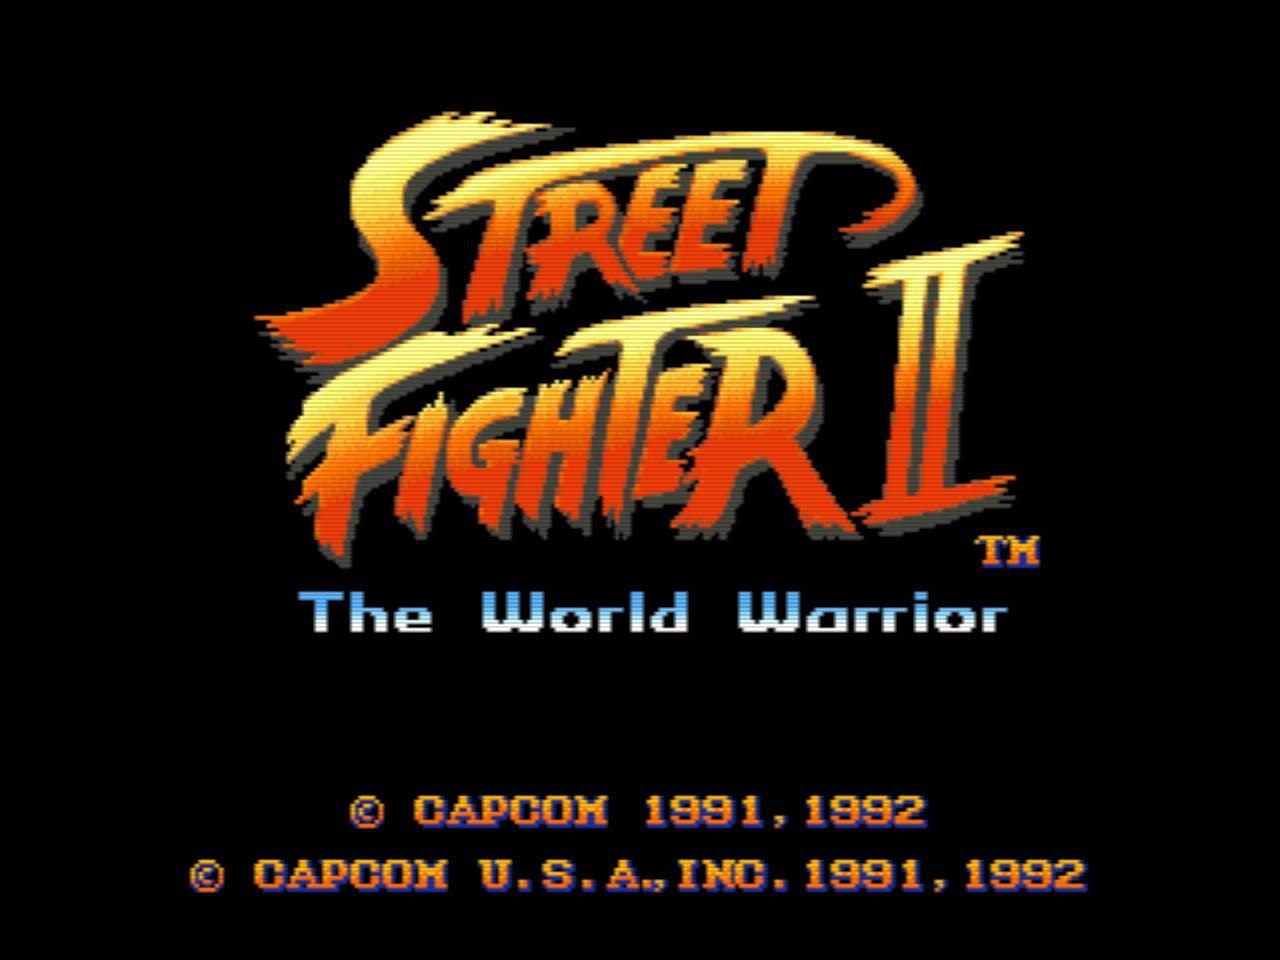 GAMECOIN STREET FIGHTER II C